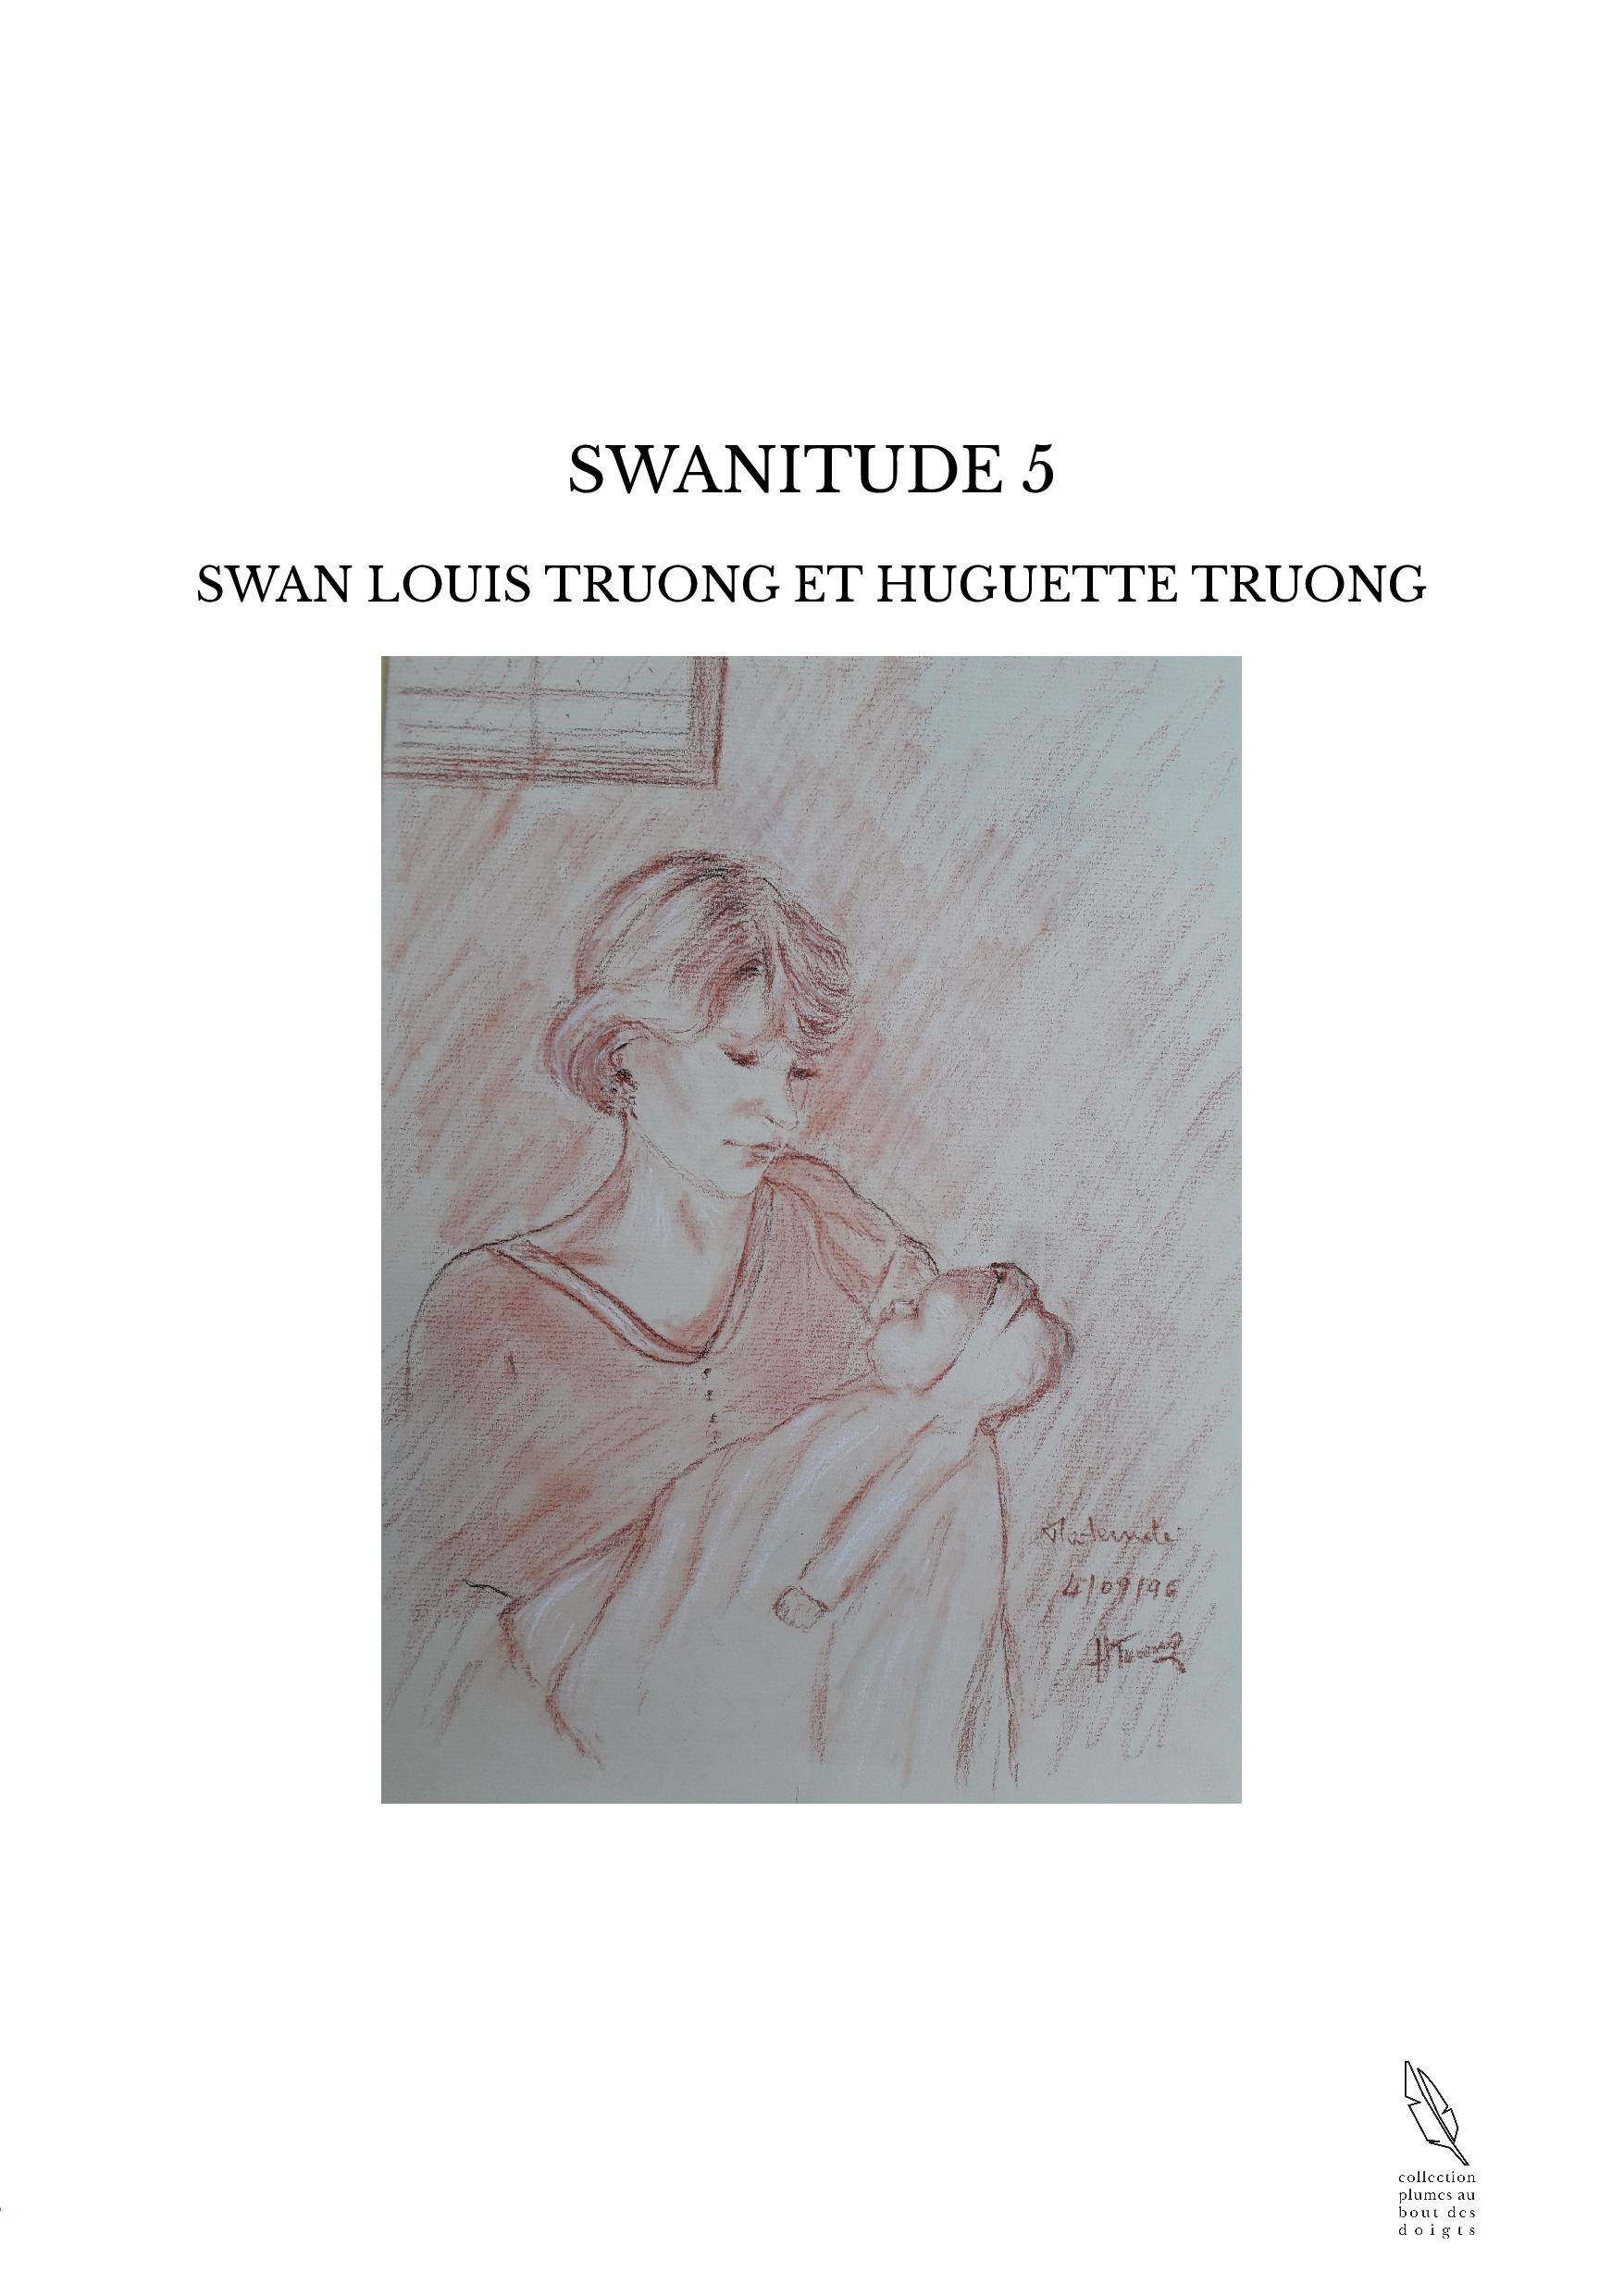 SWANITUDE 5